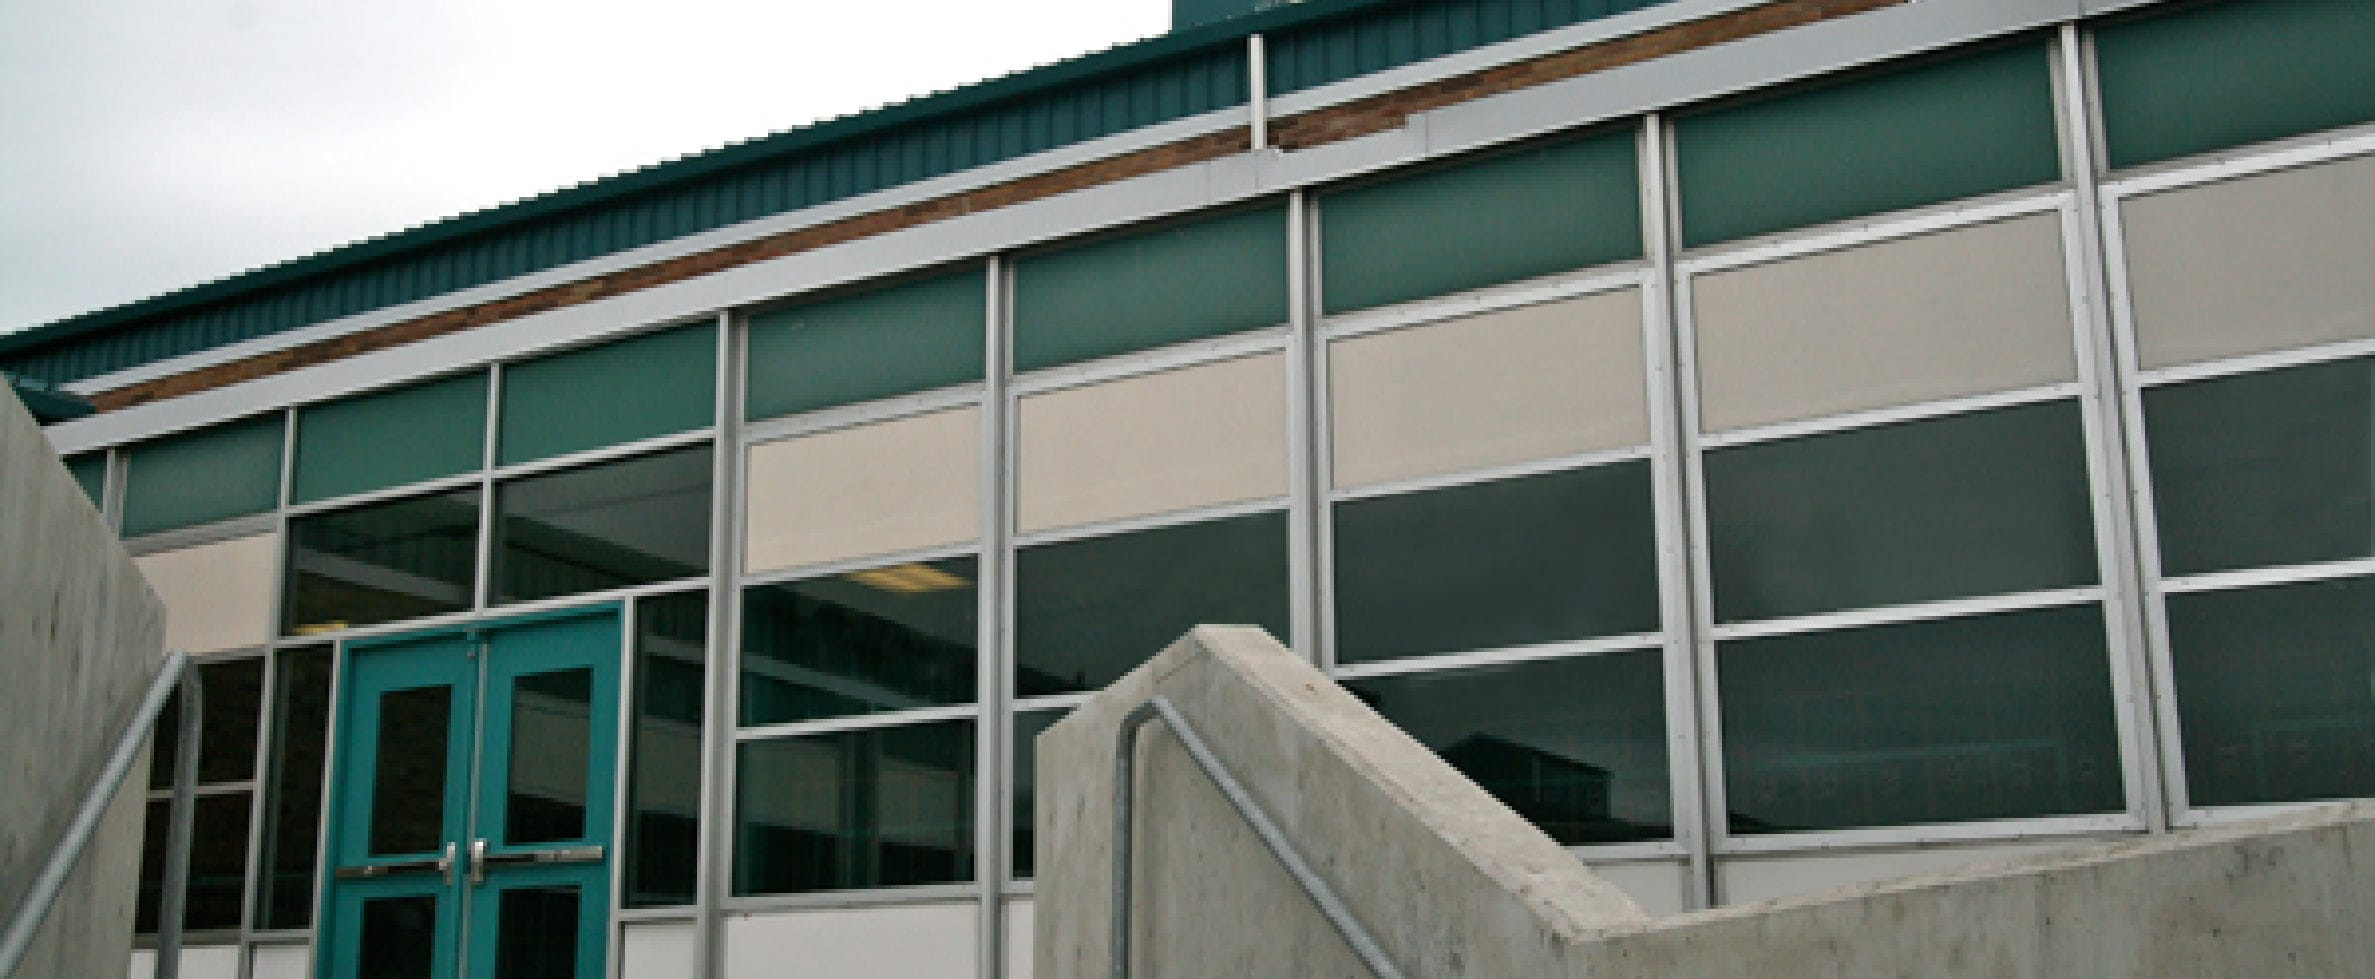 Dimmitt-Middle-School-Architecural-Windows-Doors